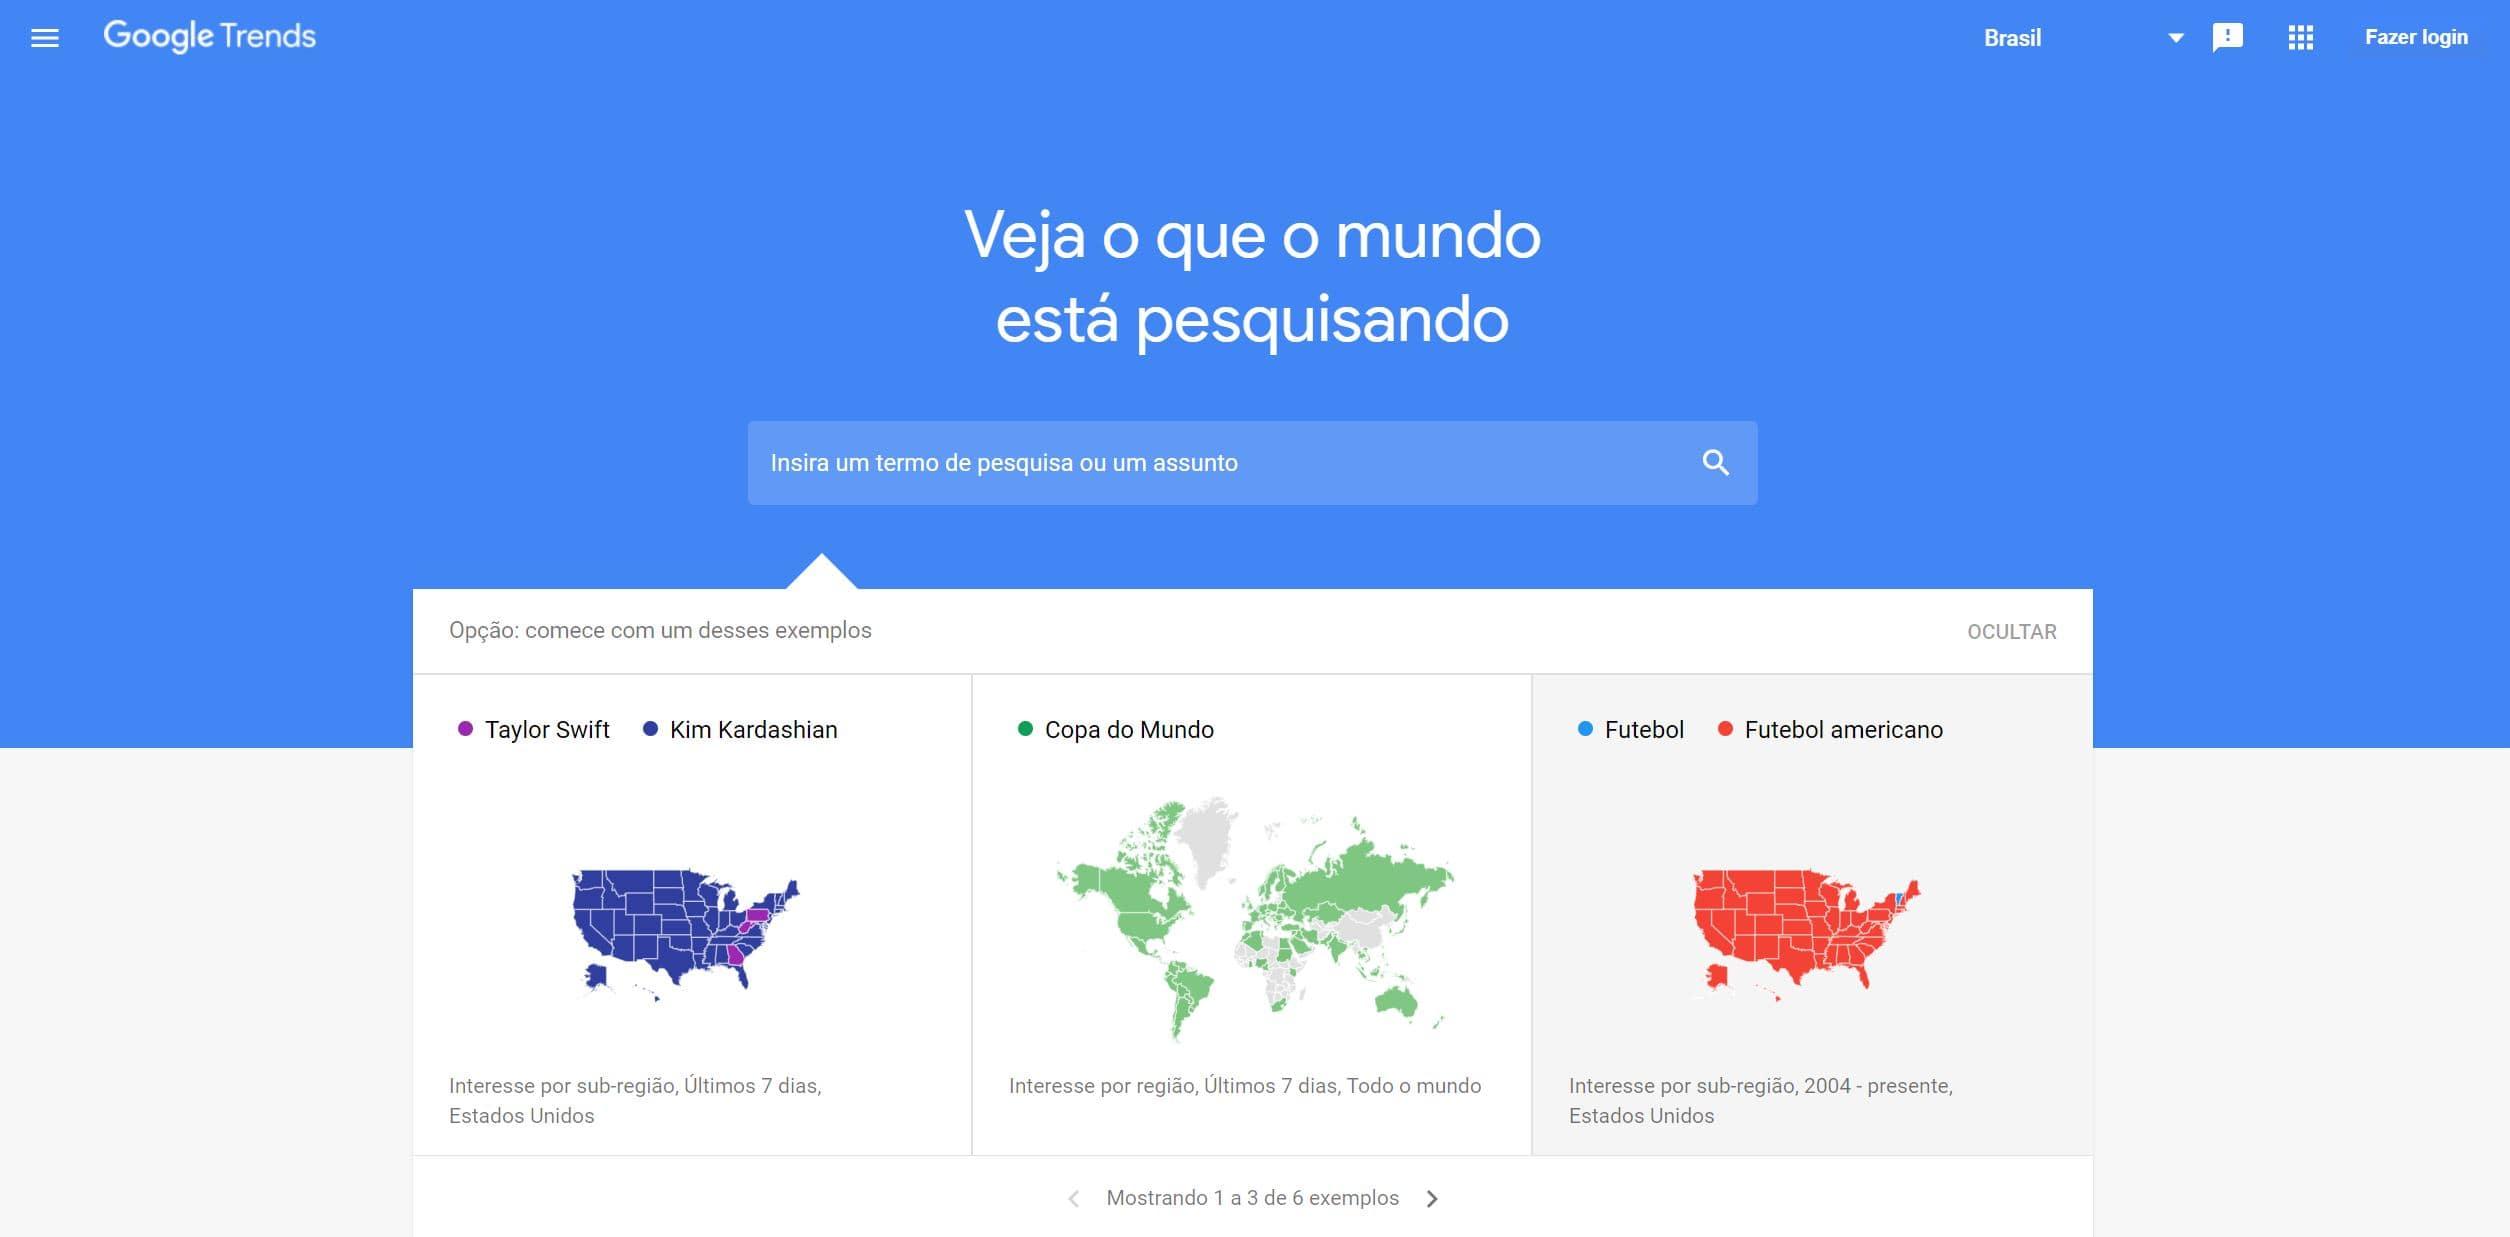 screenshot Google Trends - Análise da concorrência